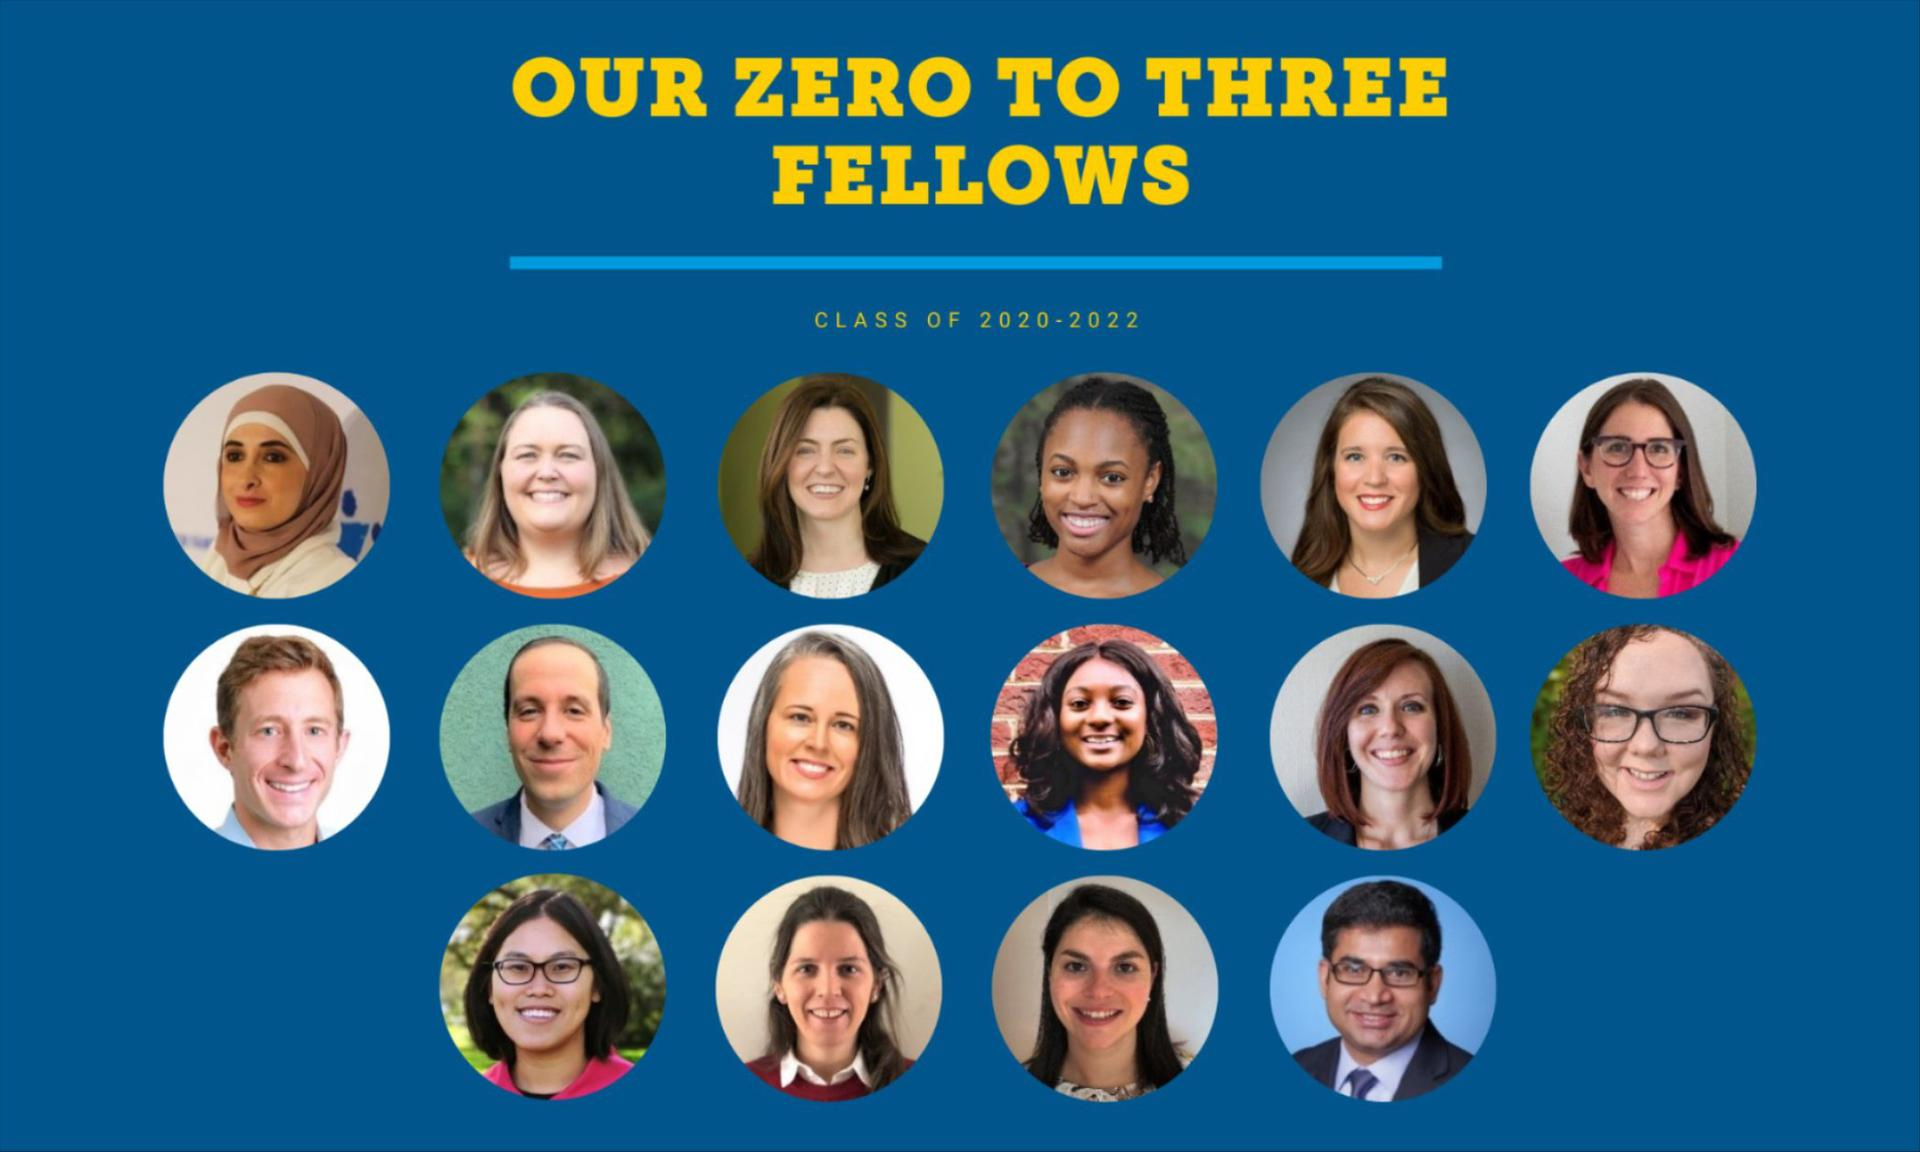 ZERO TO THREE Fellowship Class of 2020-2022